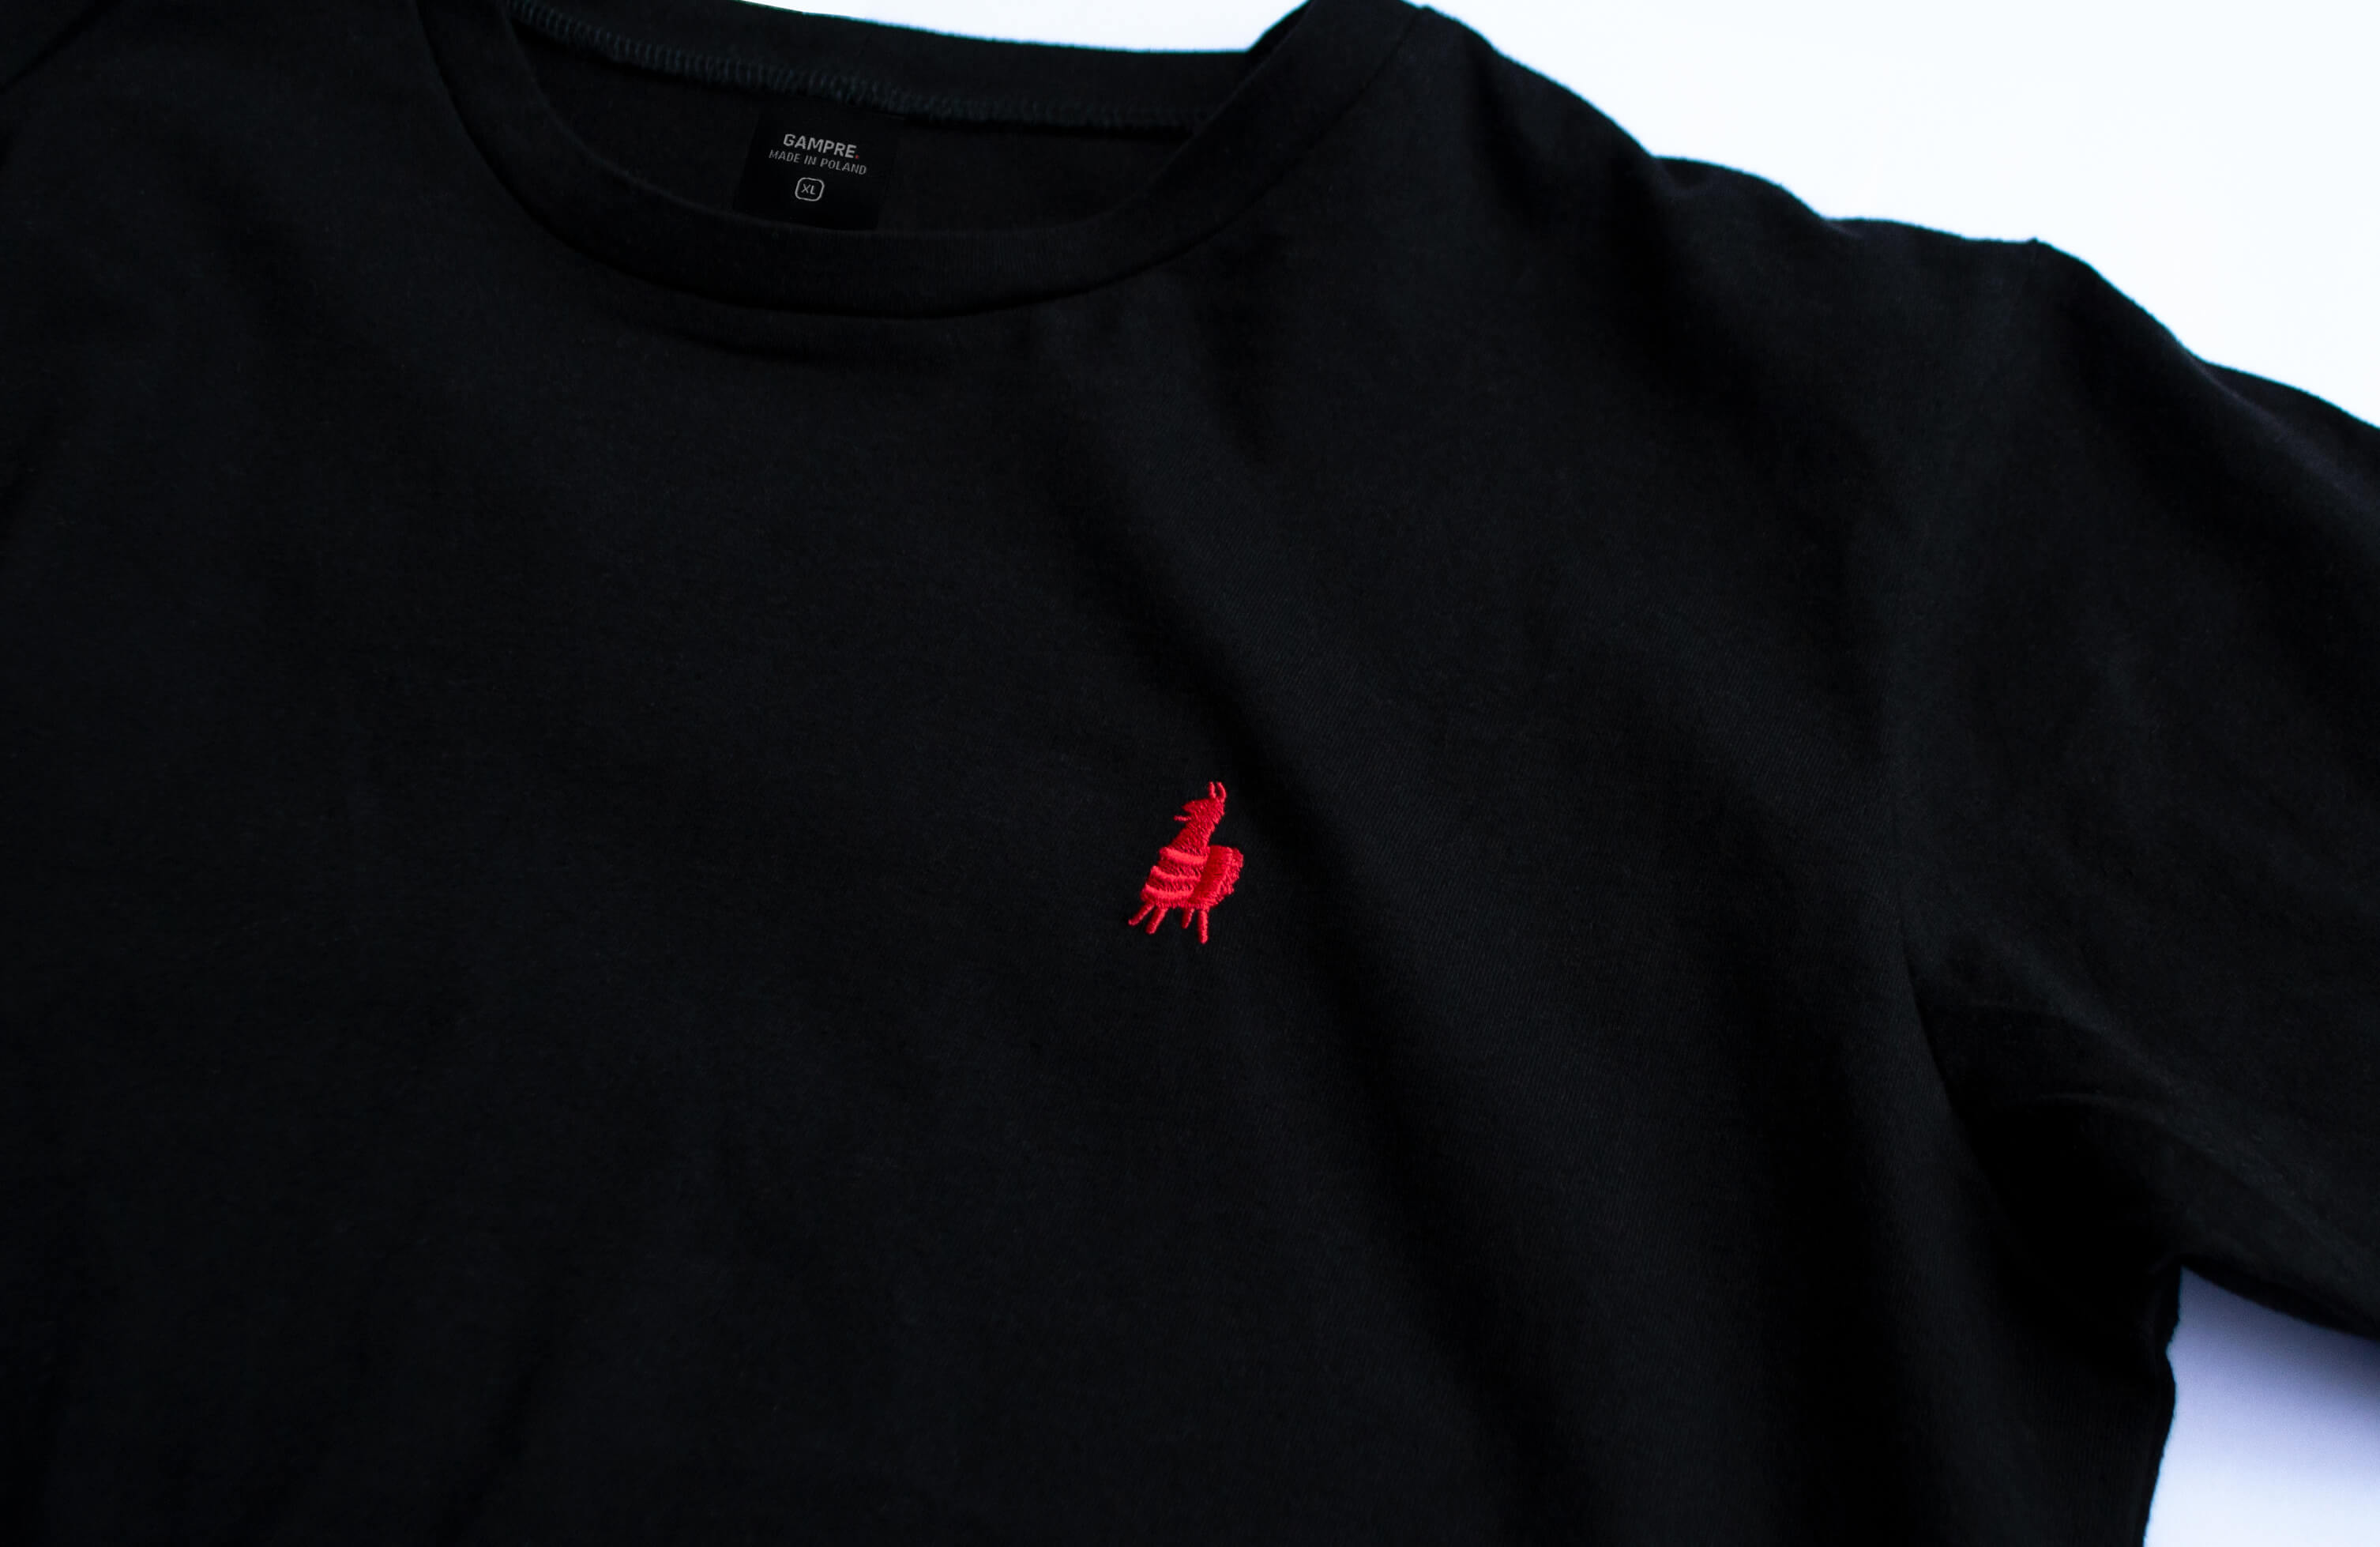 Koszulka Lama Lauren - zdjęcie #2